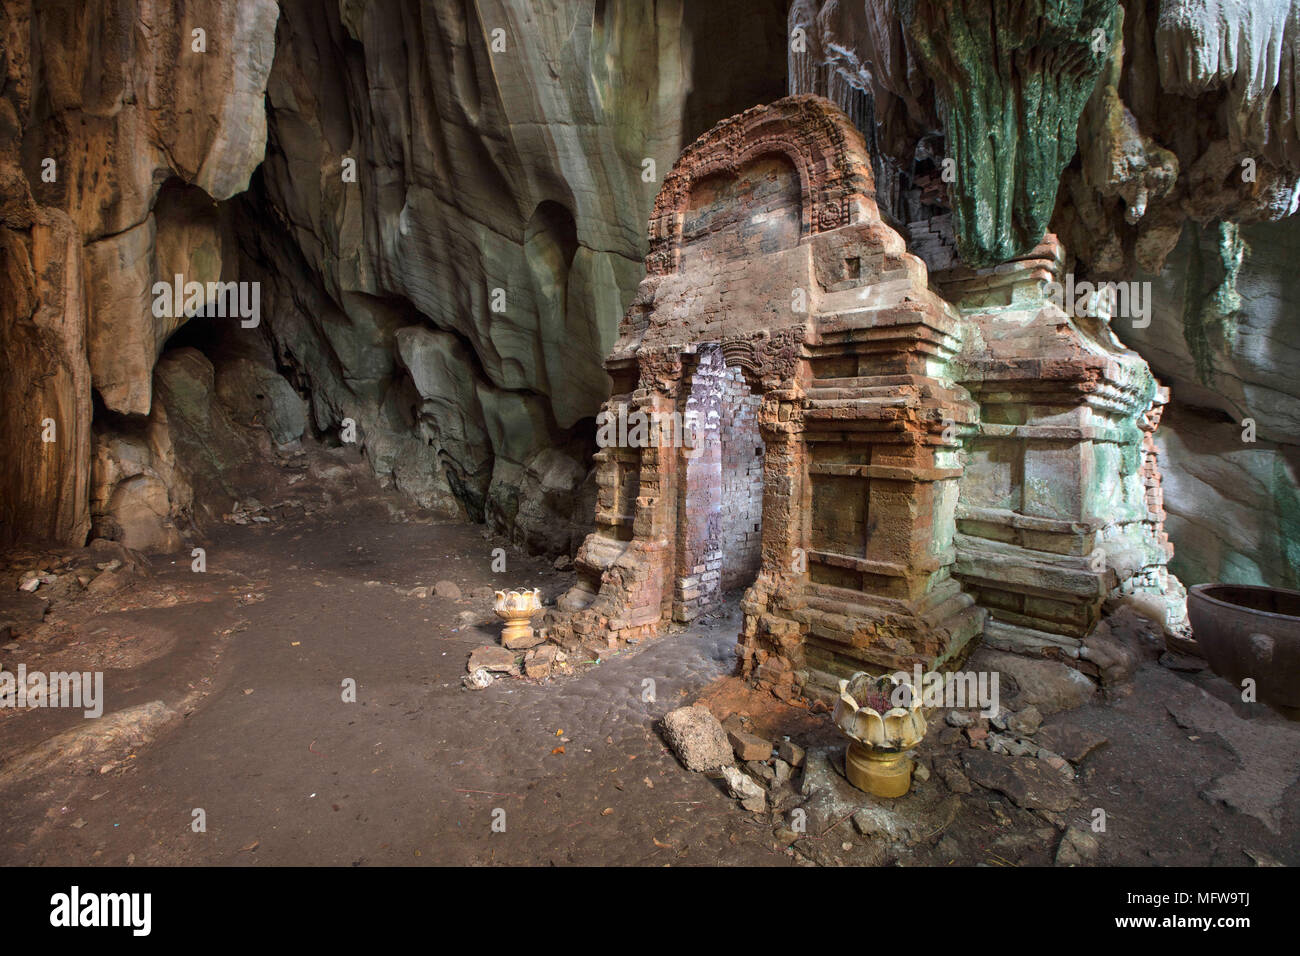 Phnom Chhnork Khmer Hindu cave temple in Kampot province, Cambodia - Stock Image